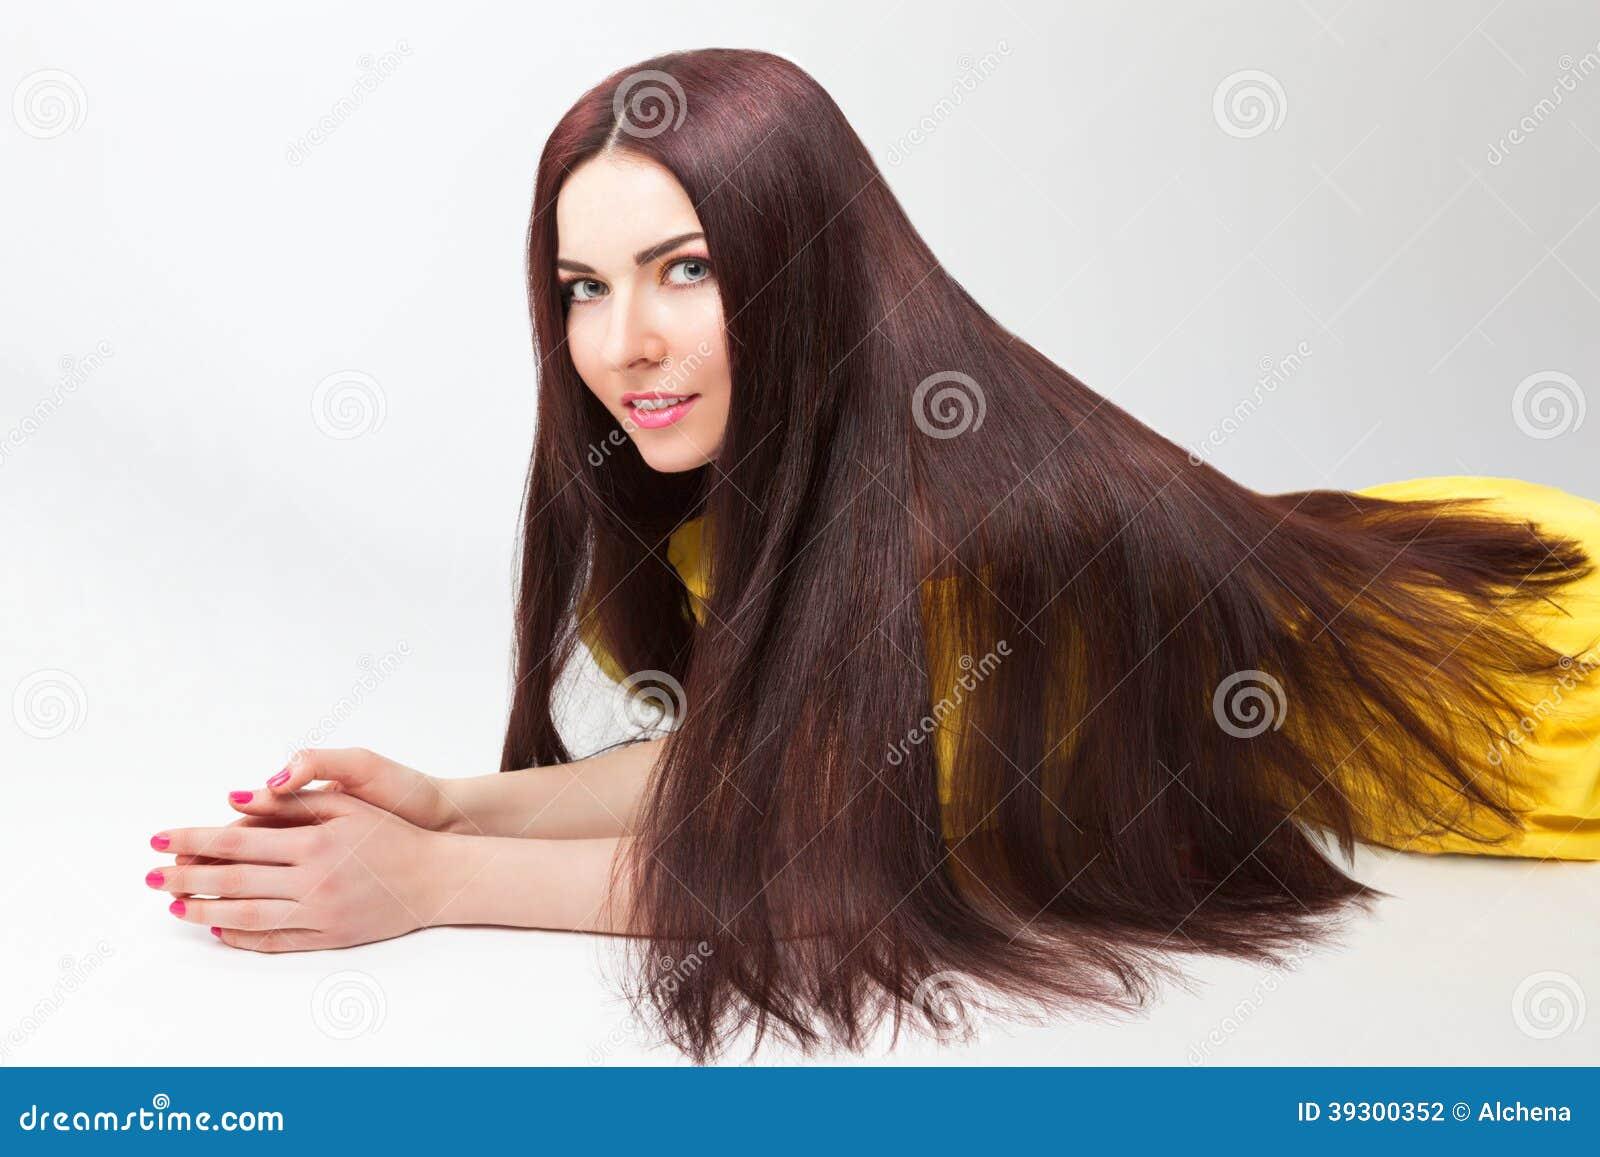 Creamy Thick White Girl